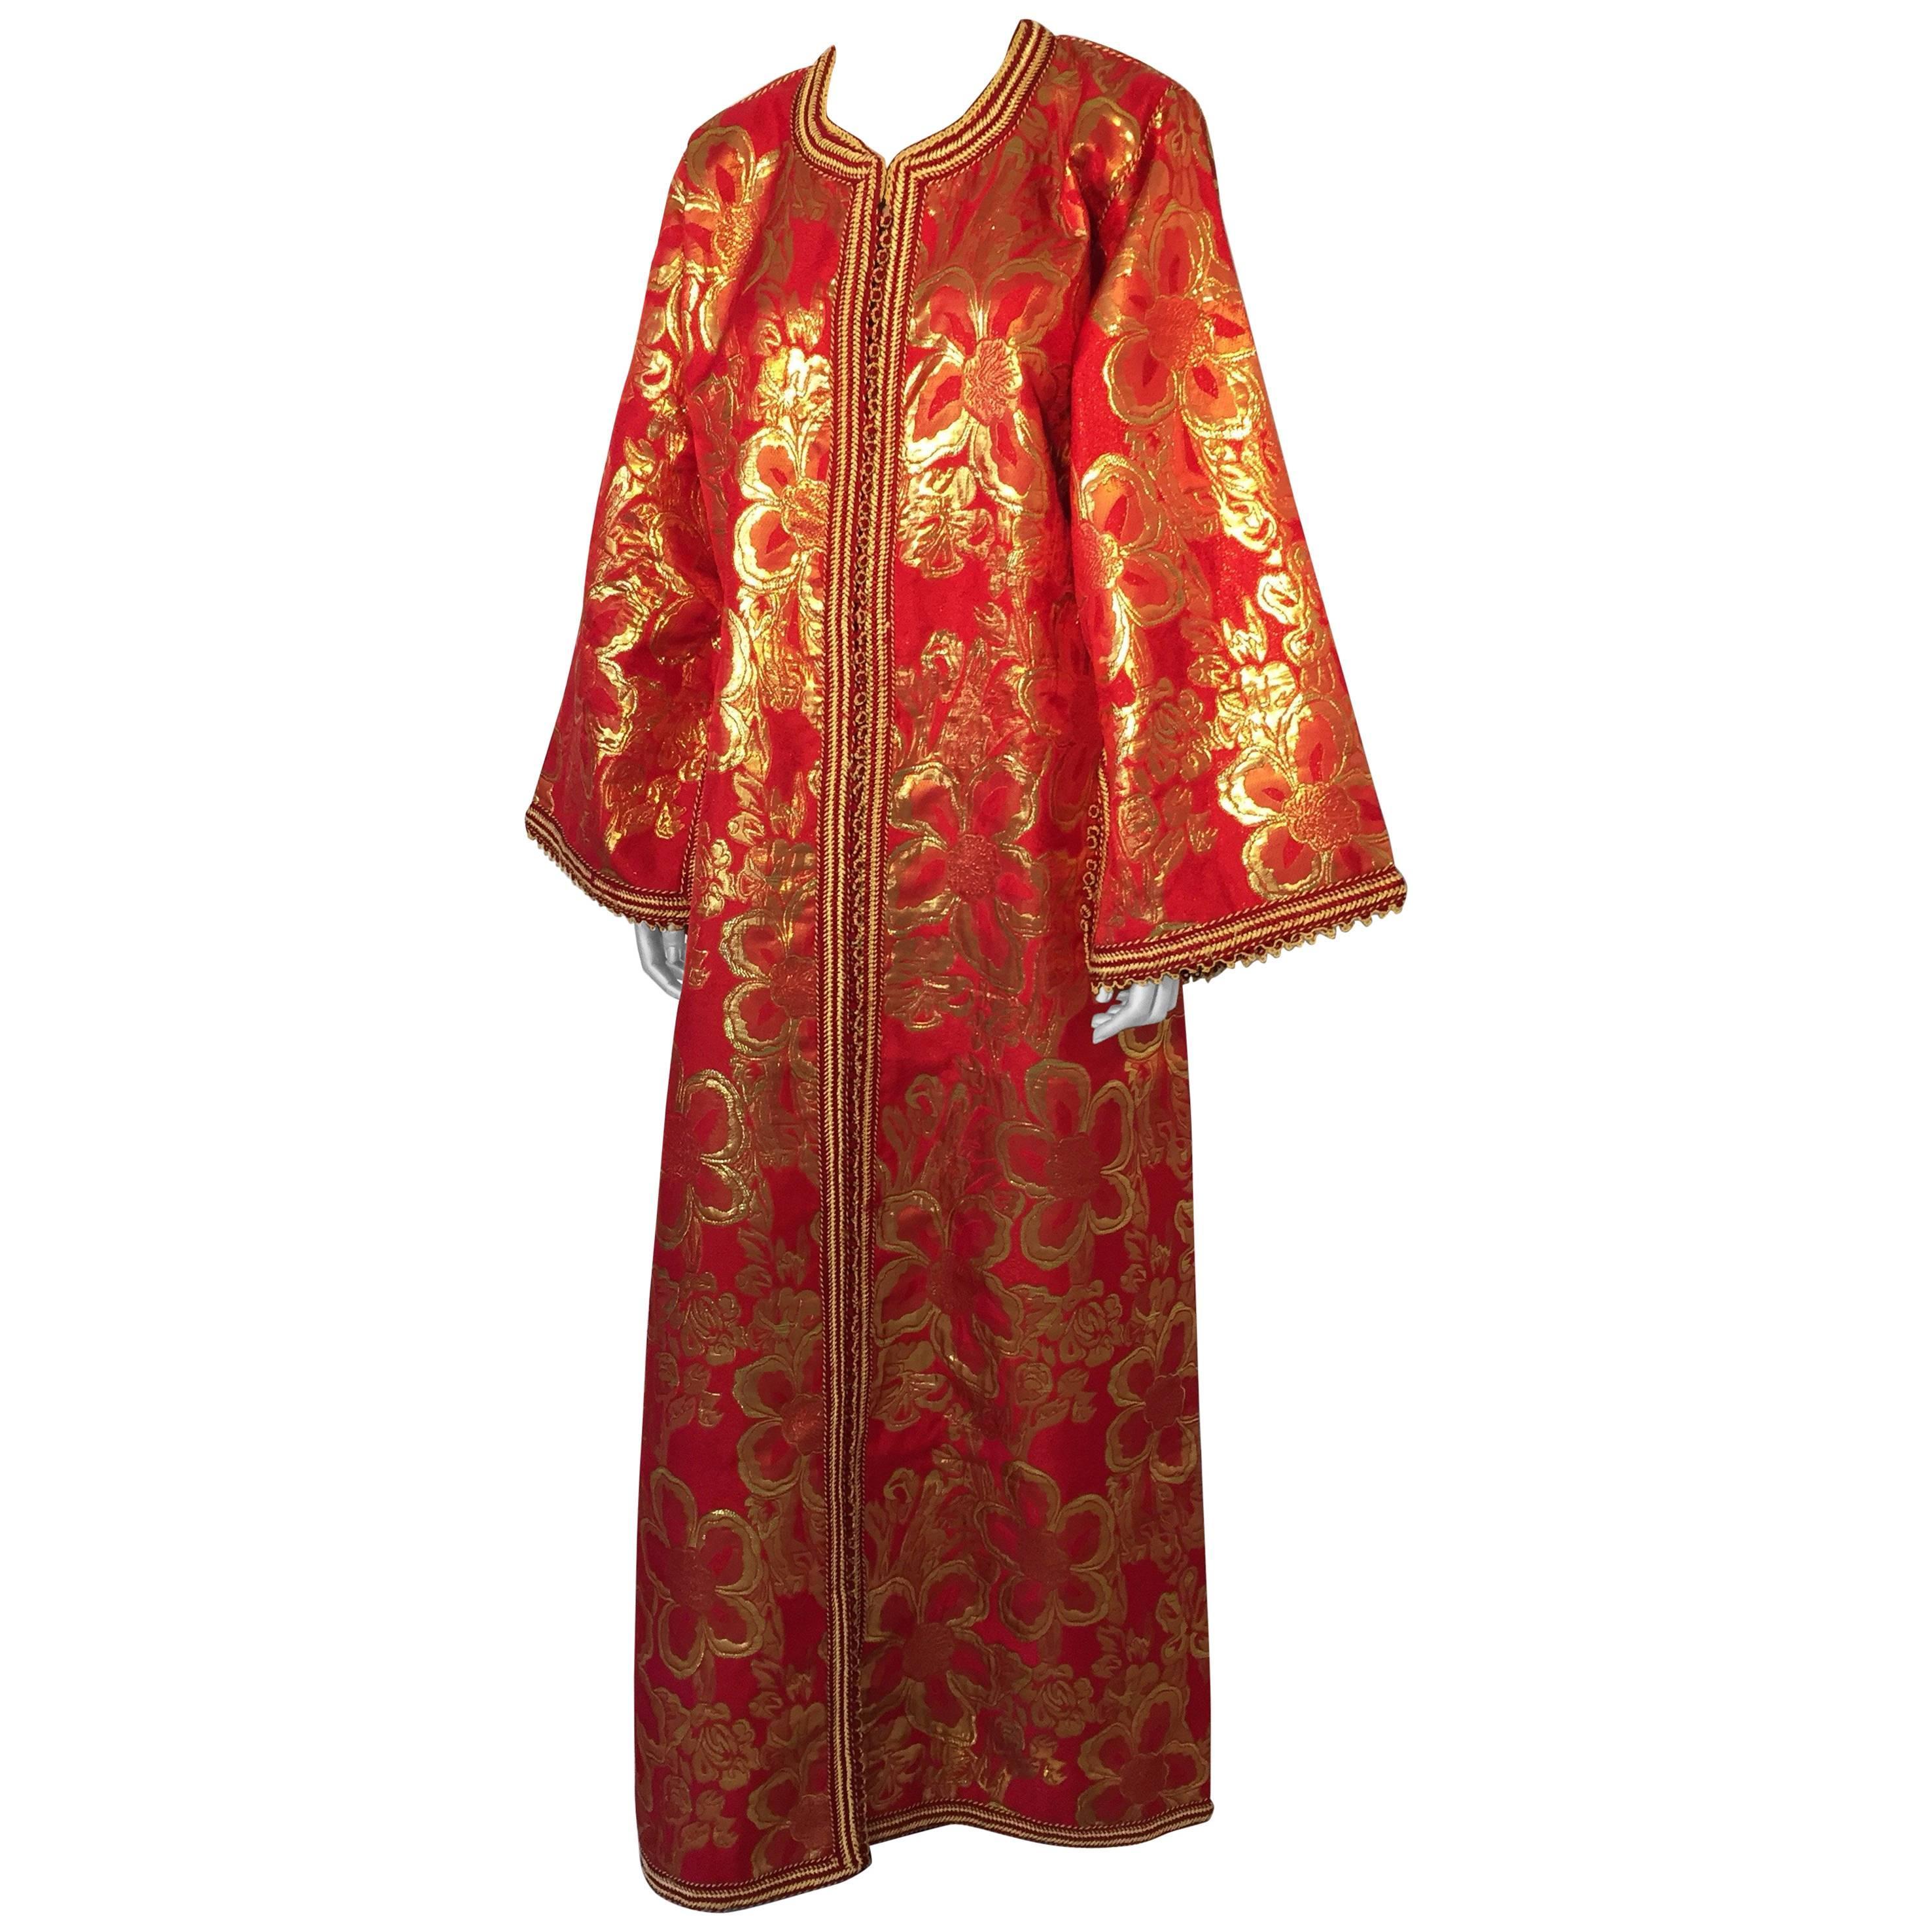 Vintage Moroccan Kaftan 1970s Red and Gold Floral Brocade Caftan Maxi Dress